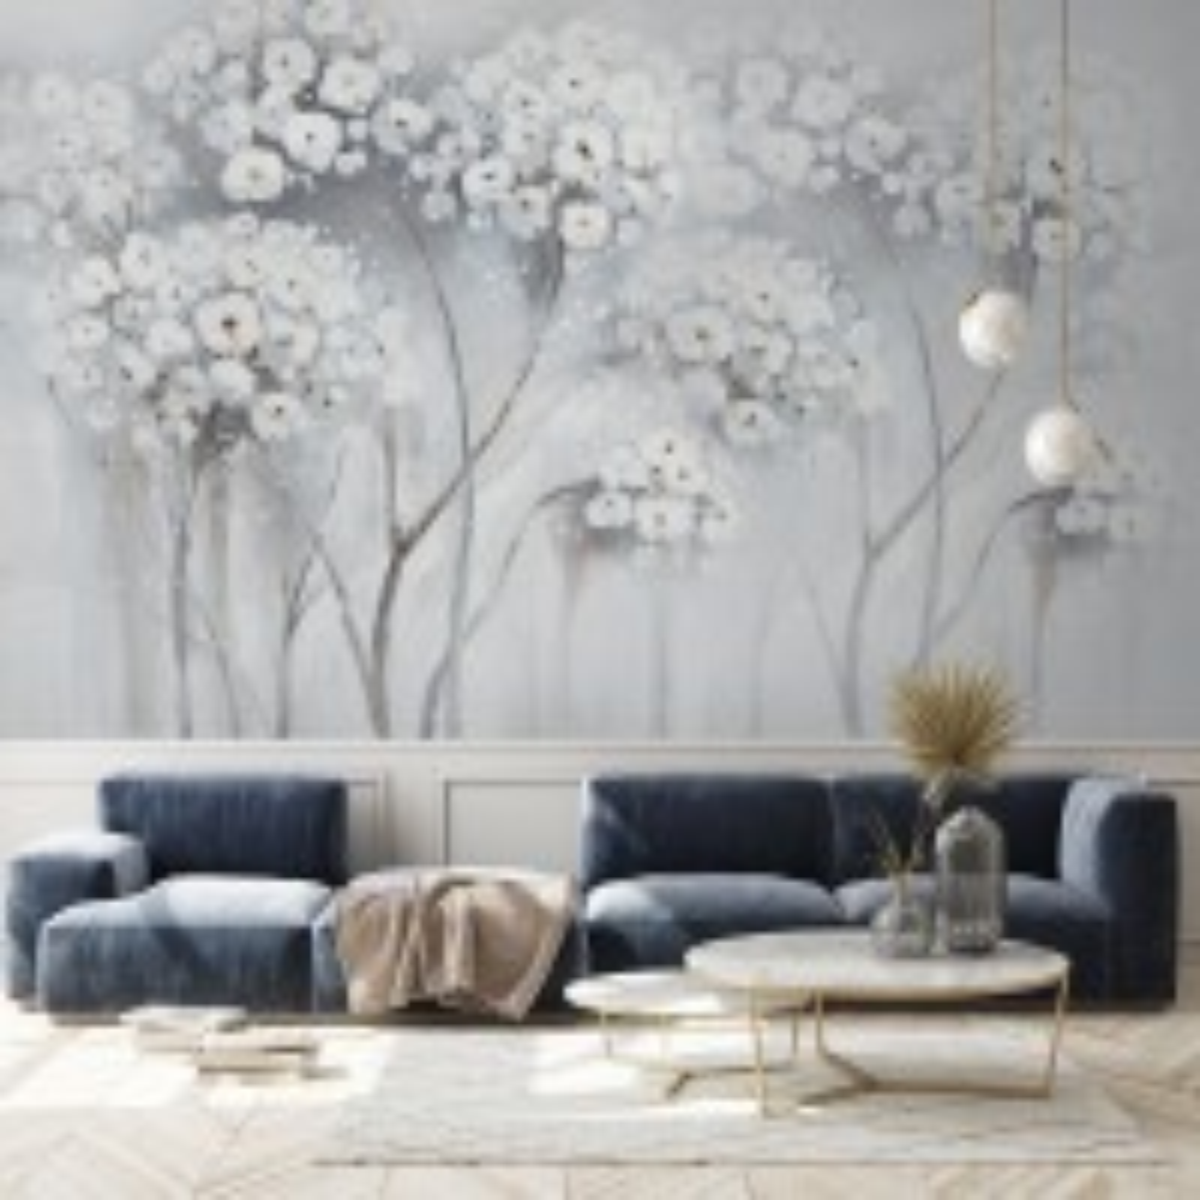 Watercolor Painting White Flowers Wallpaper Mural